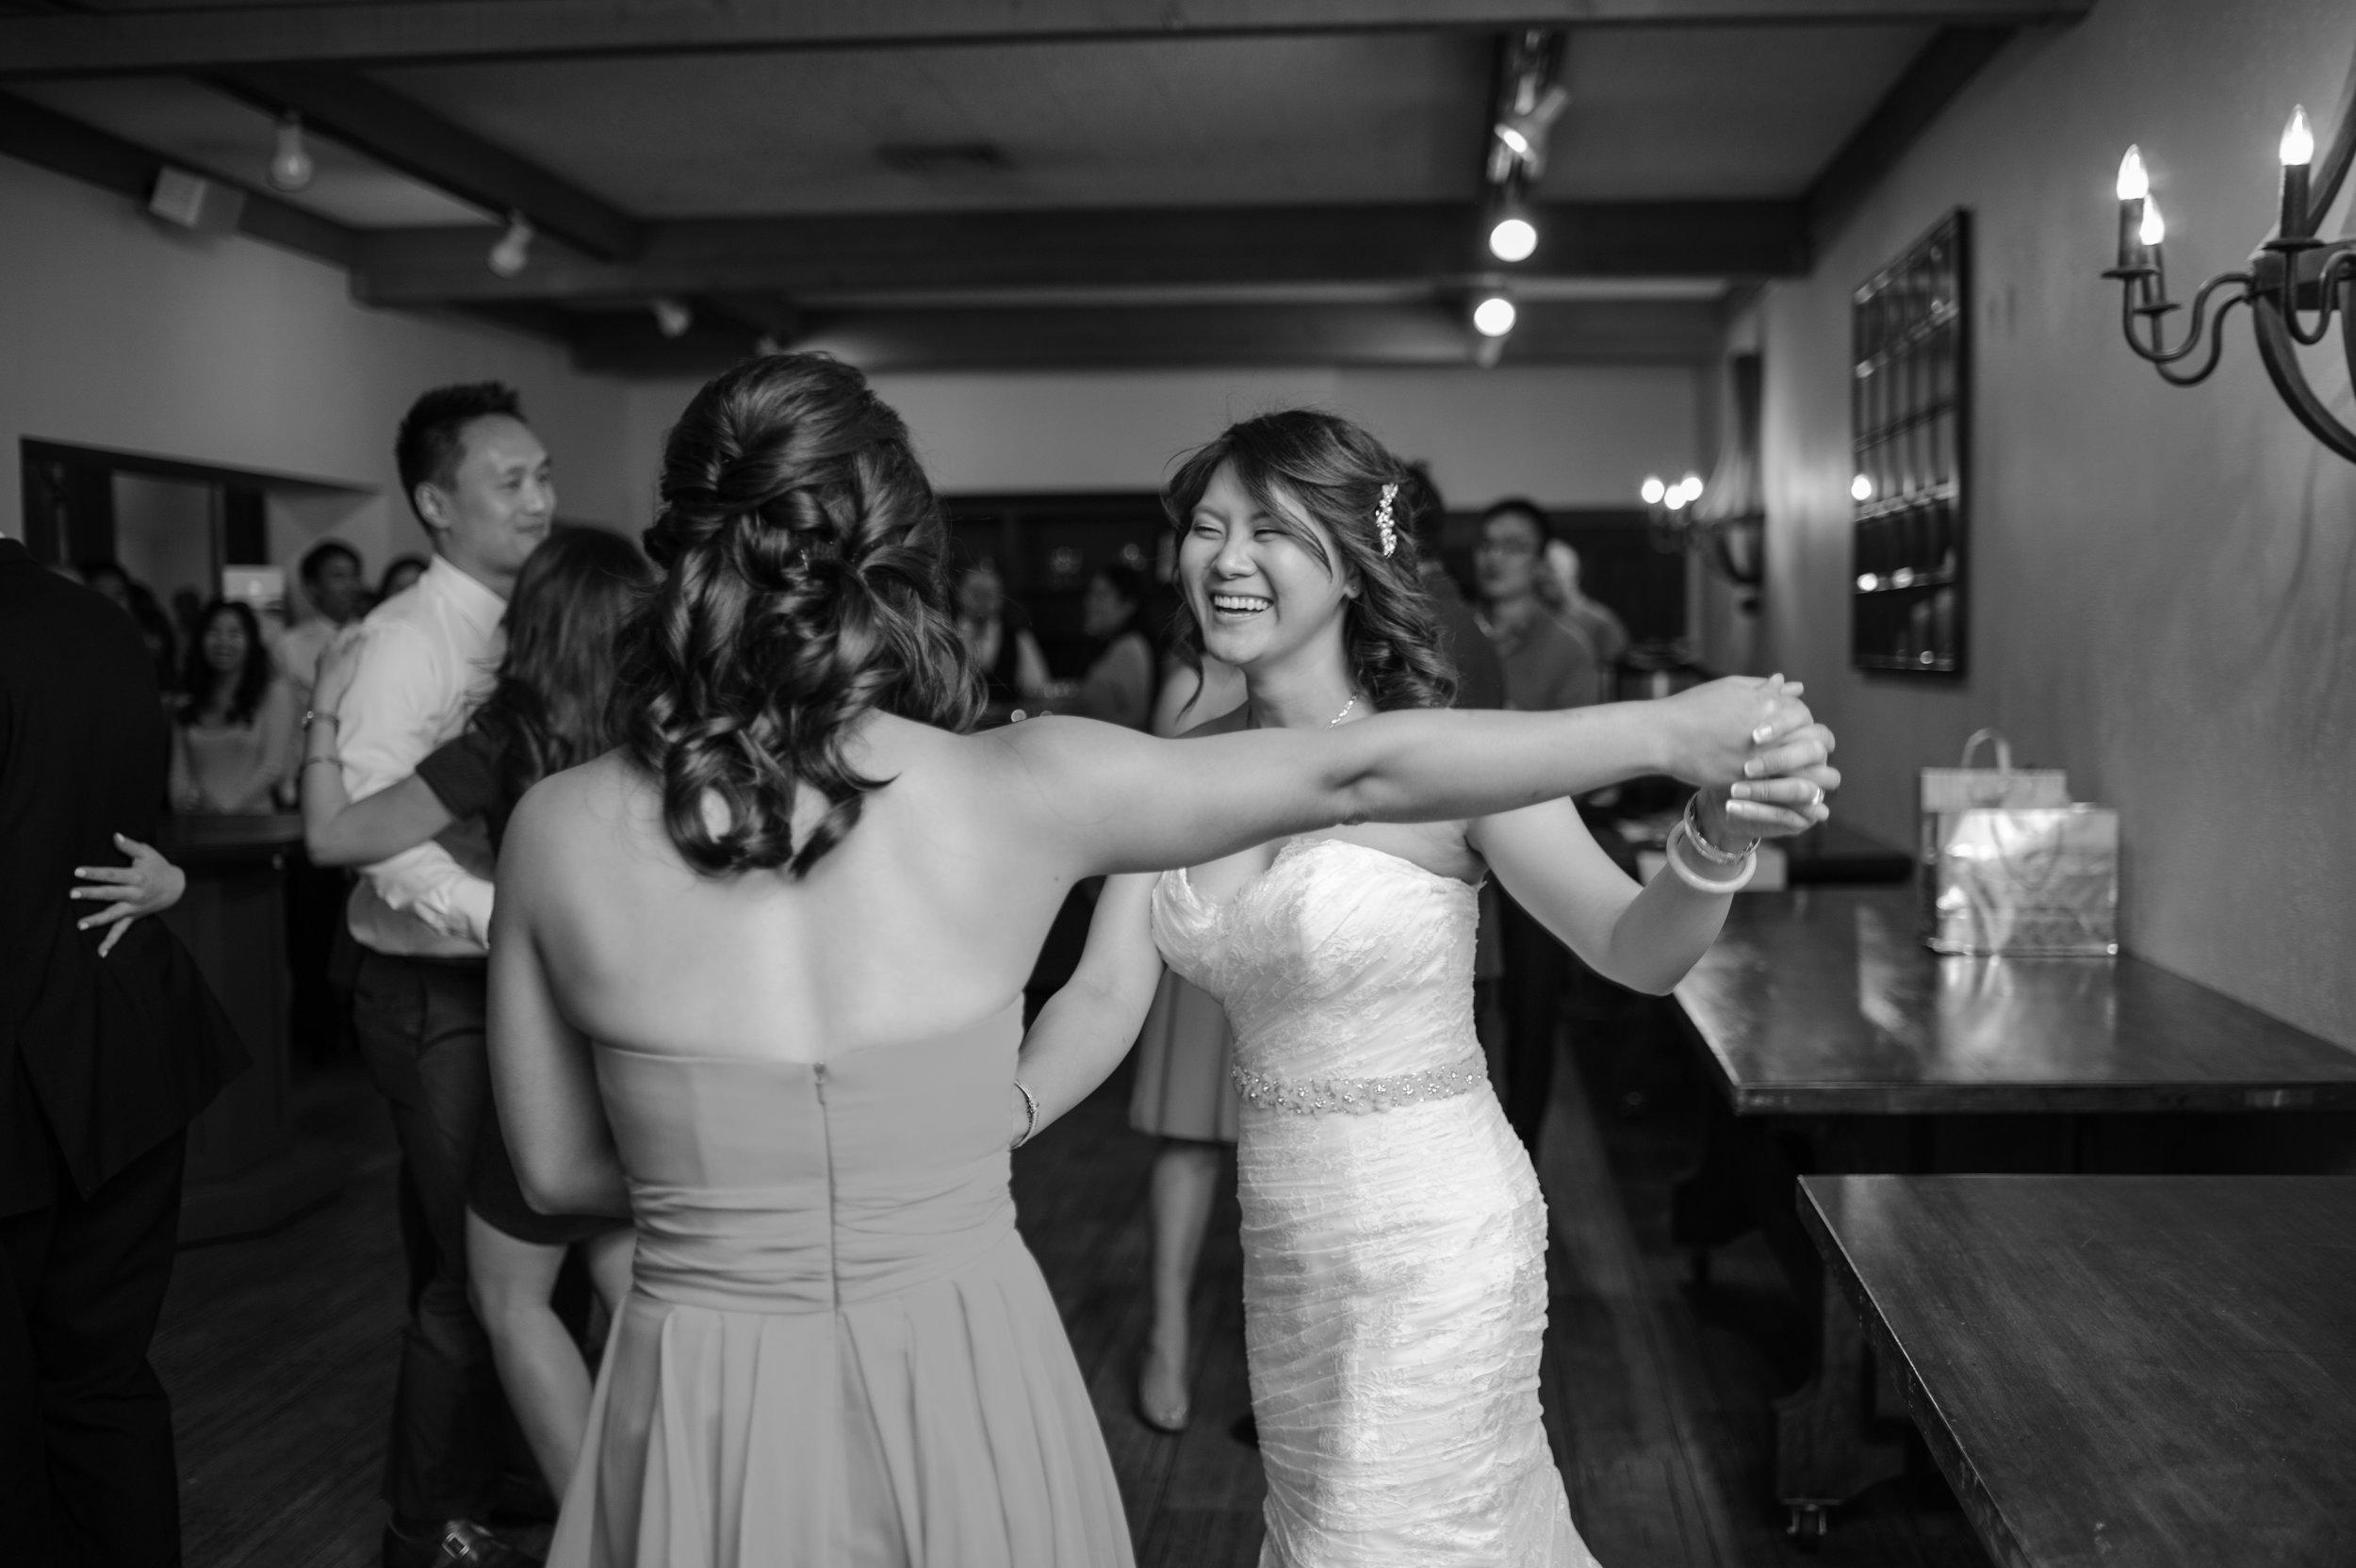 qui-david-050-wente-vineyards-livermore-wedding-photographer-katherine-nicole-photography.JPG